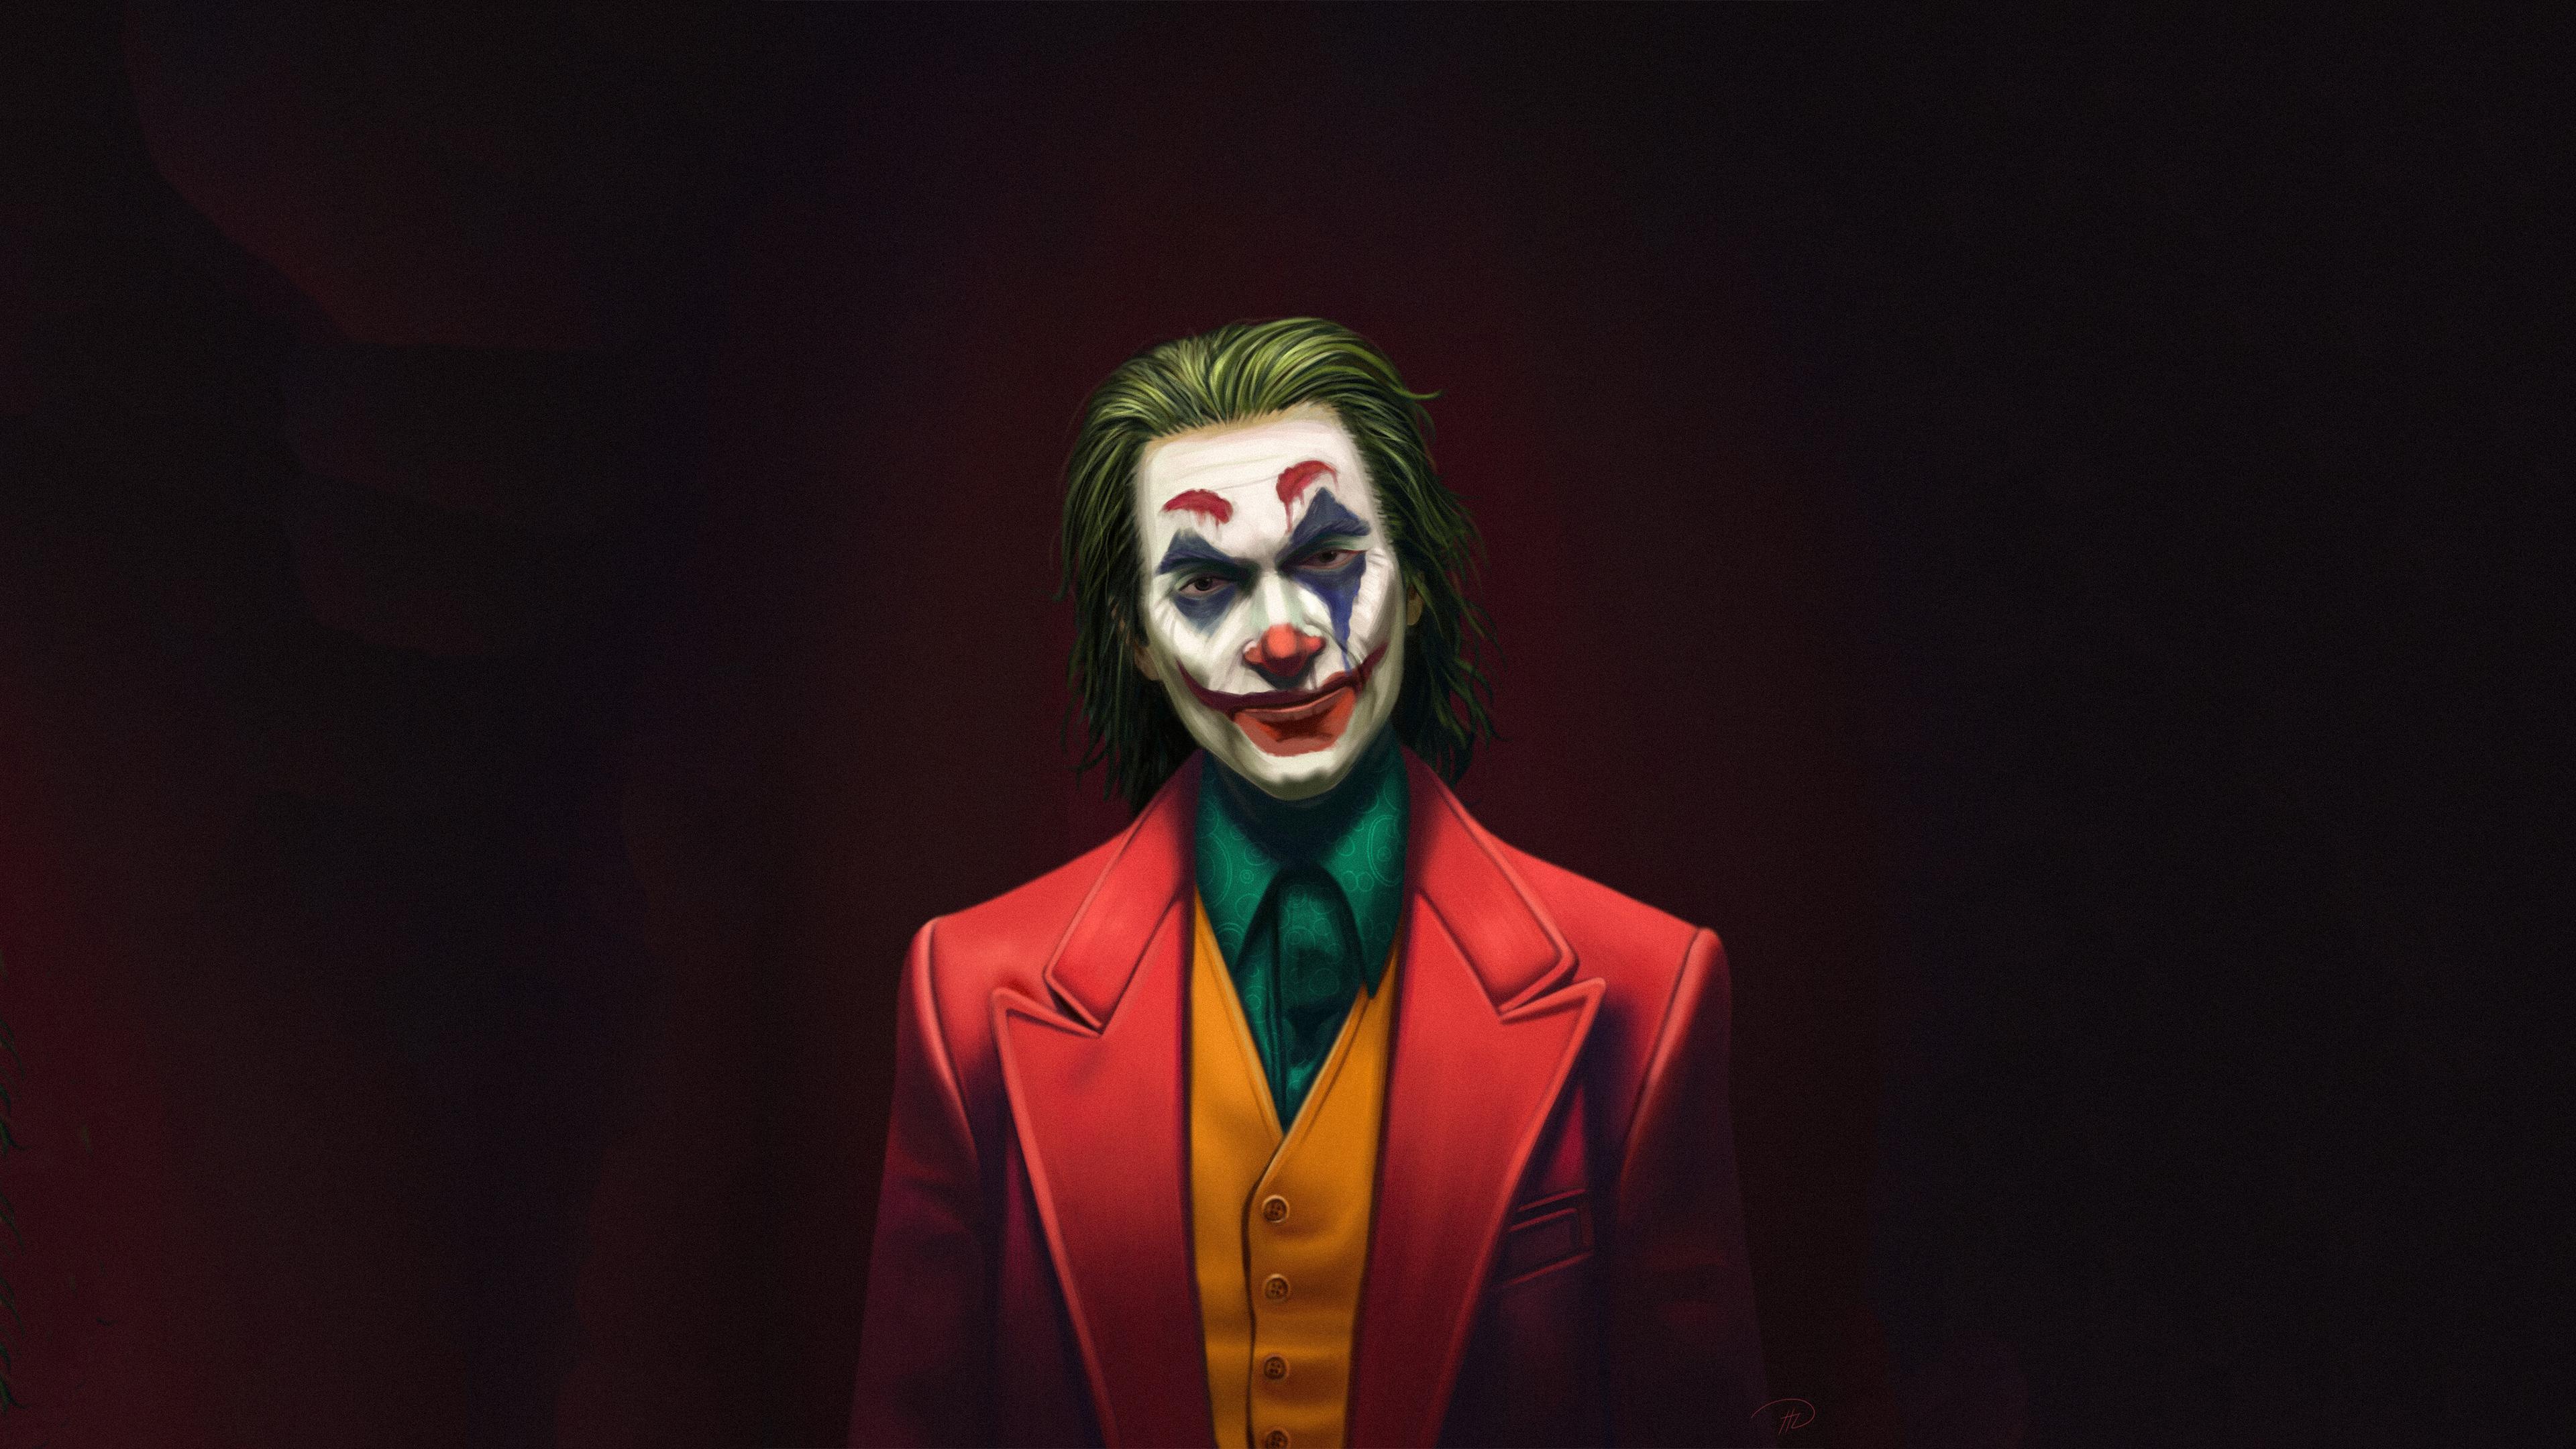 Joker Movie Joaquin Phoenix Art Hd Superheroes 4k